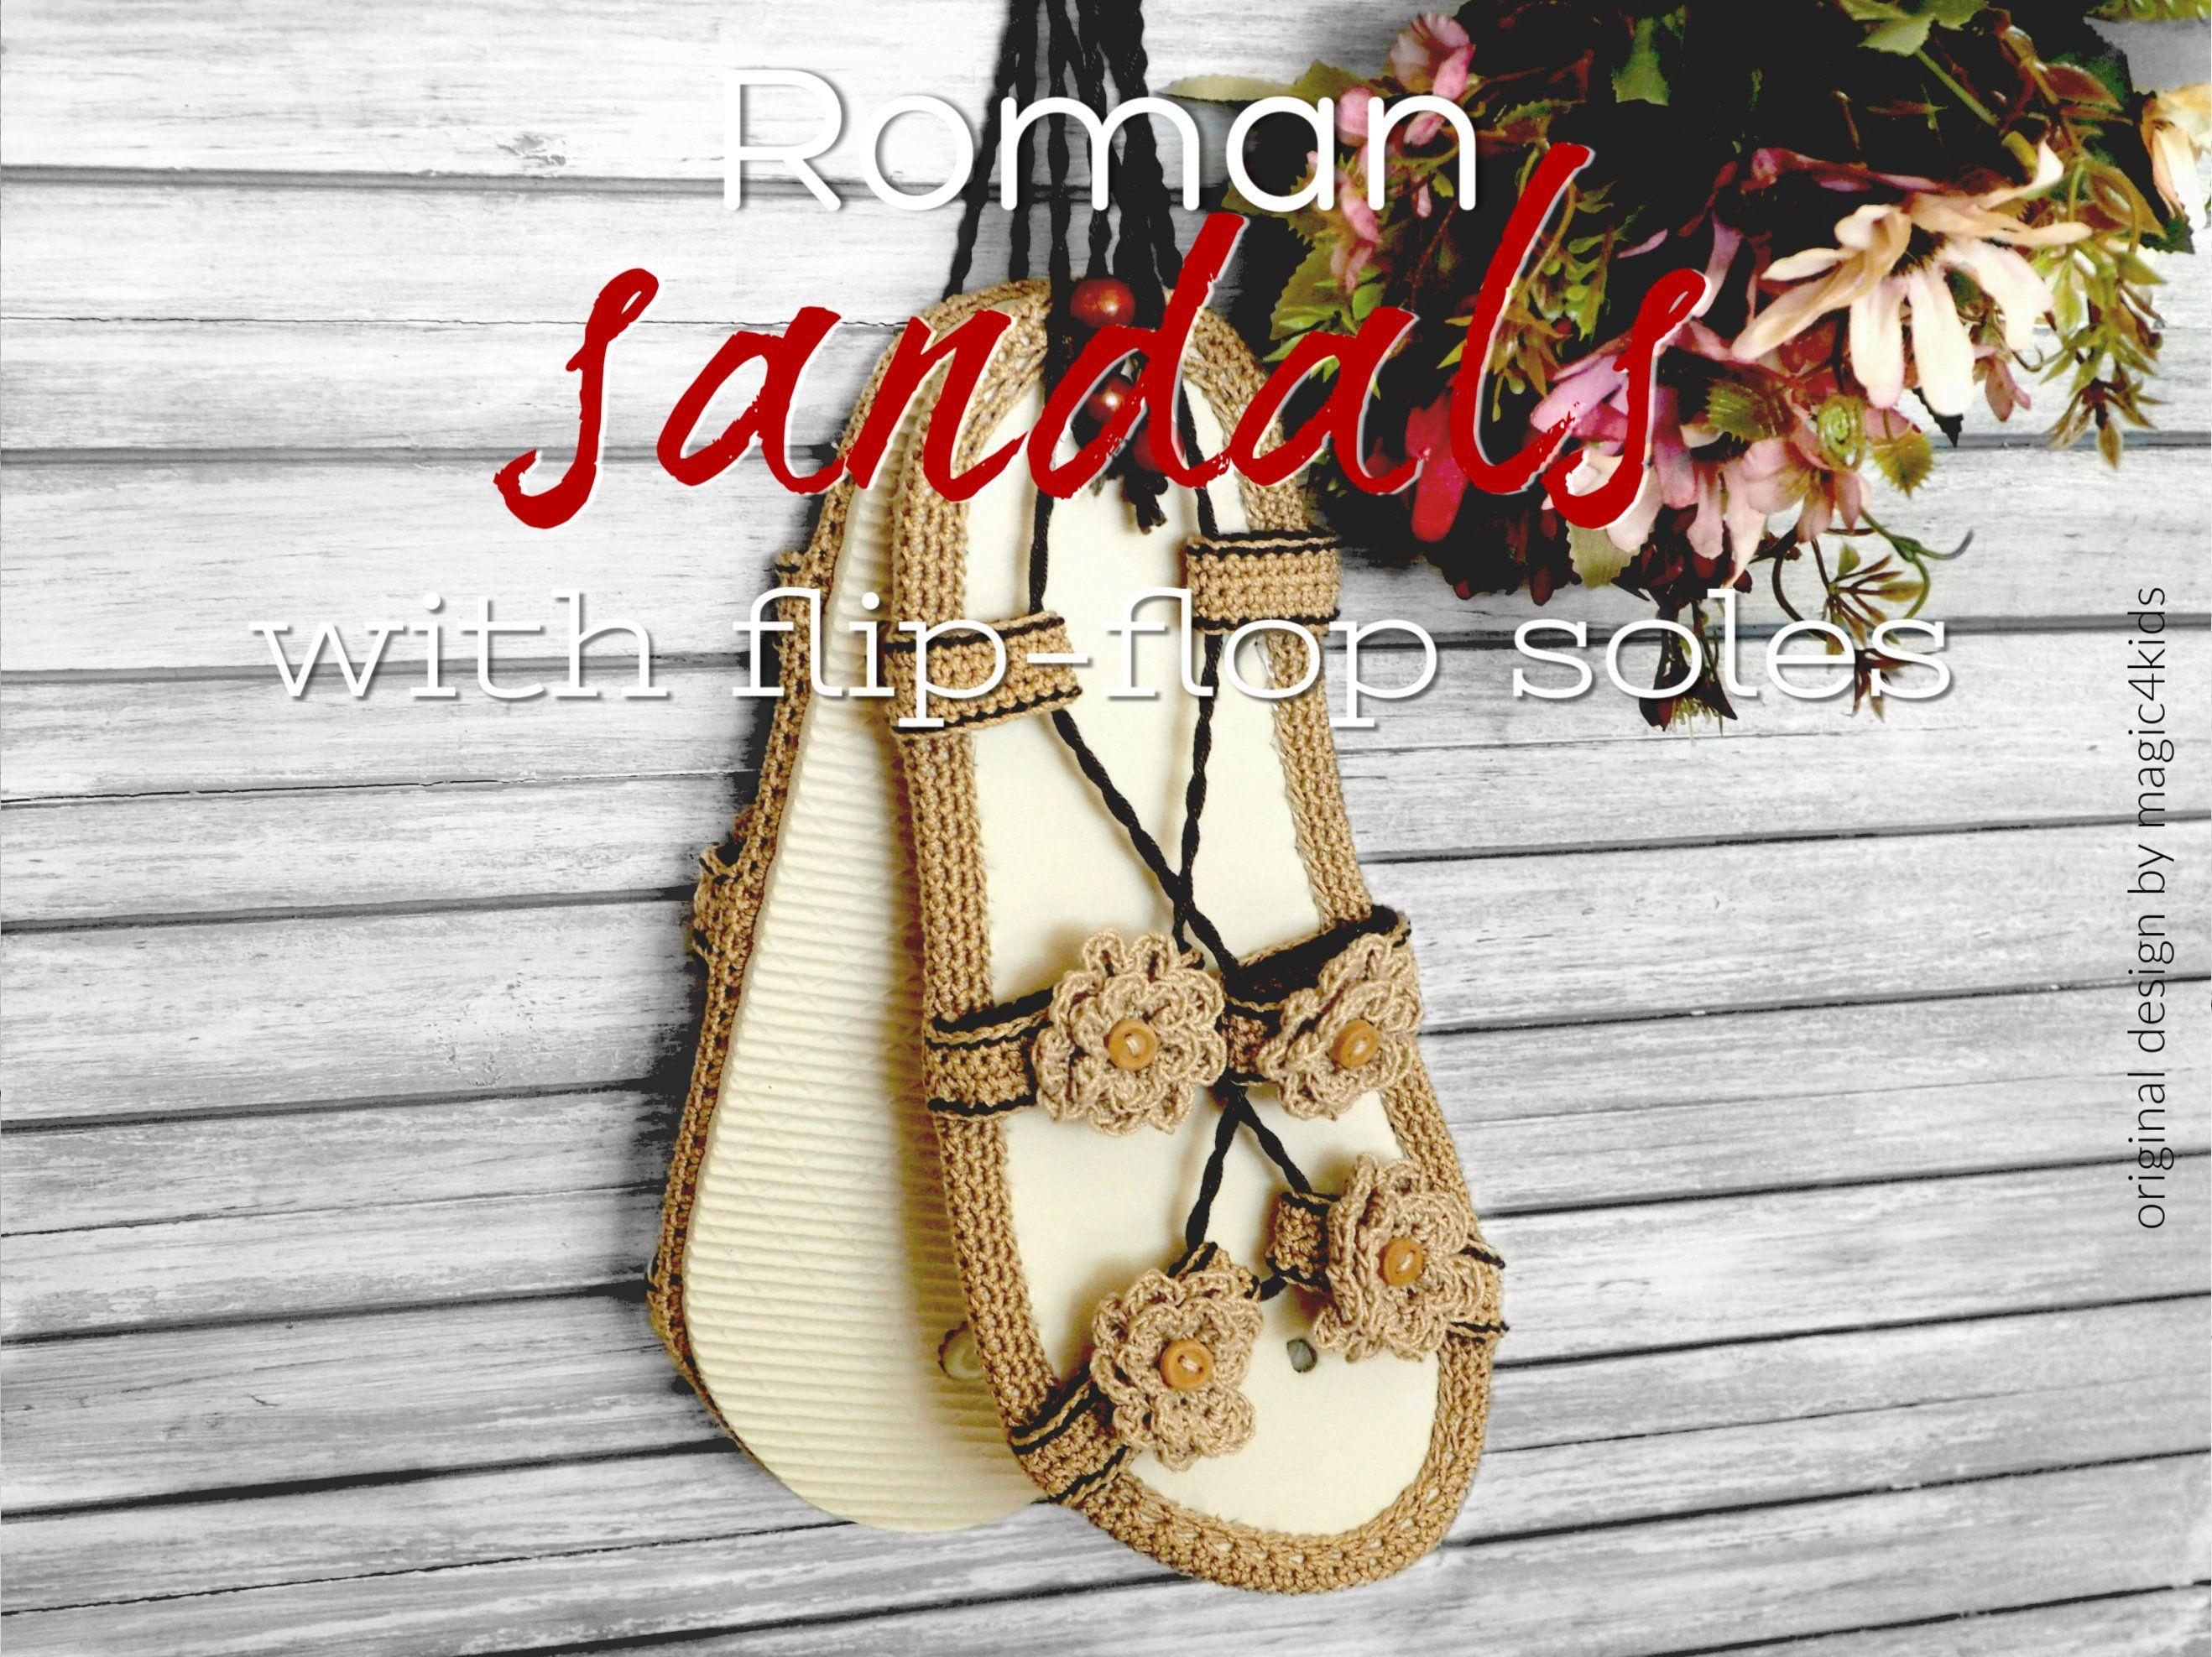 afcabe318b7f4 CROCHET PATTERN- Roman sandals on flip-flop soles,all women sizes ...